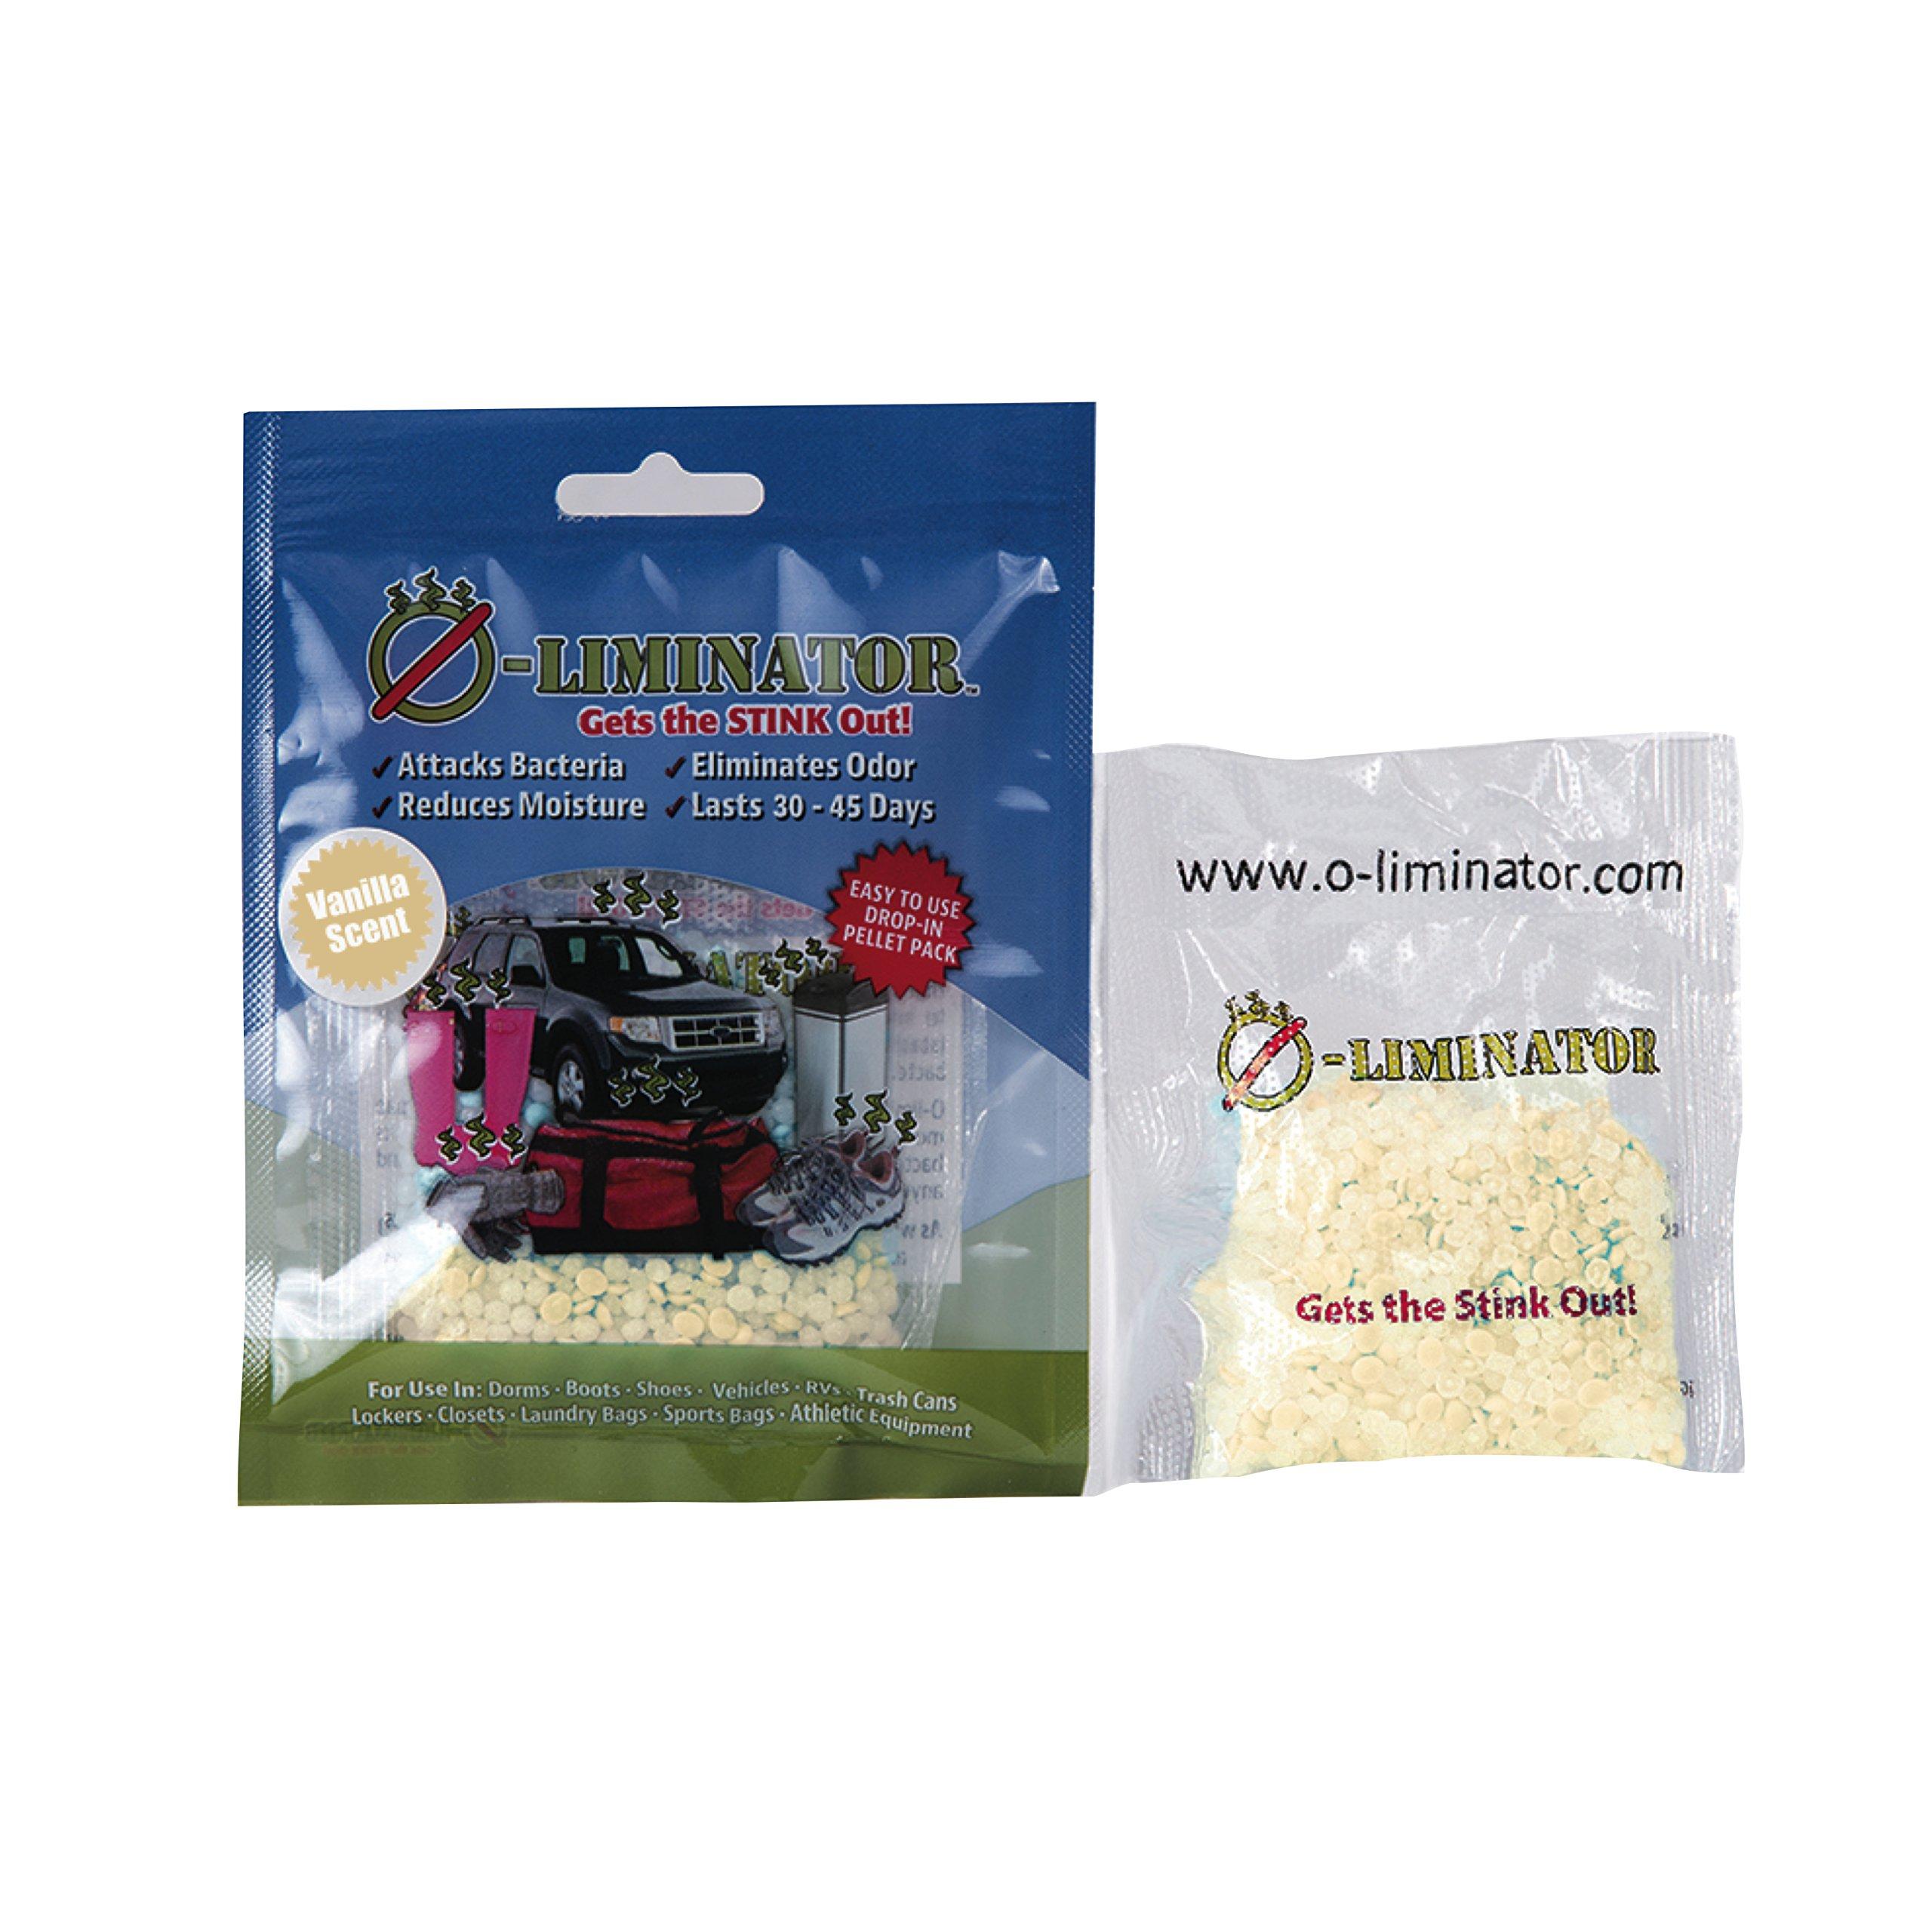 O-Liminator Soft Vanilla 892626002281 Odor Eliminator (1 Pack)